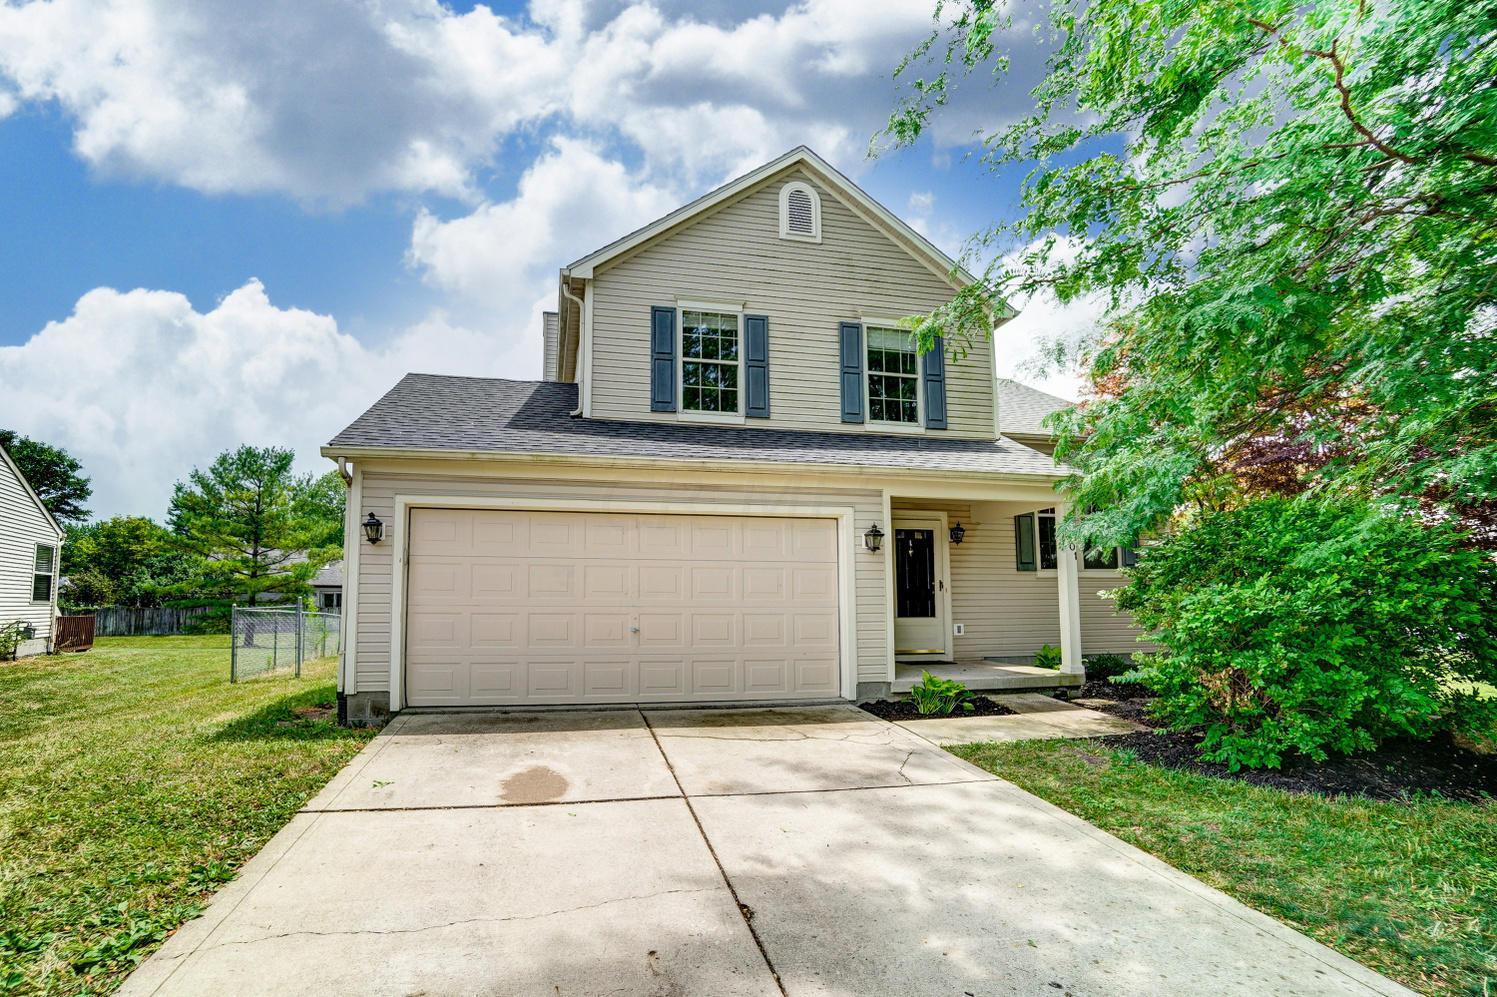 6301 Riverstone Drive, Columbus, Ohio 43228, 3 Bedrooms Bedrooms, ,3 BathroomsBathrooms,Residential,For Sale,Riverstone,220023100